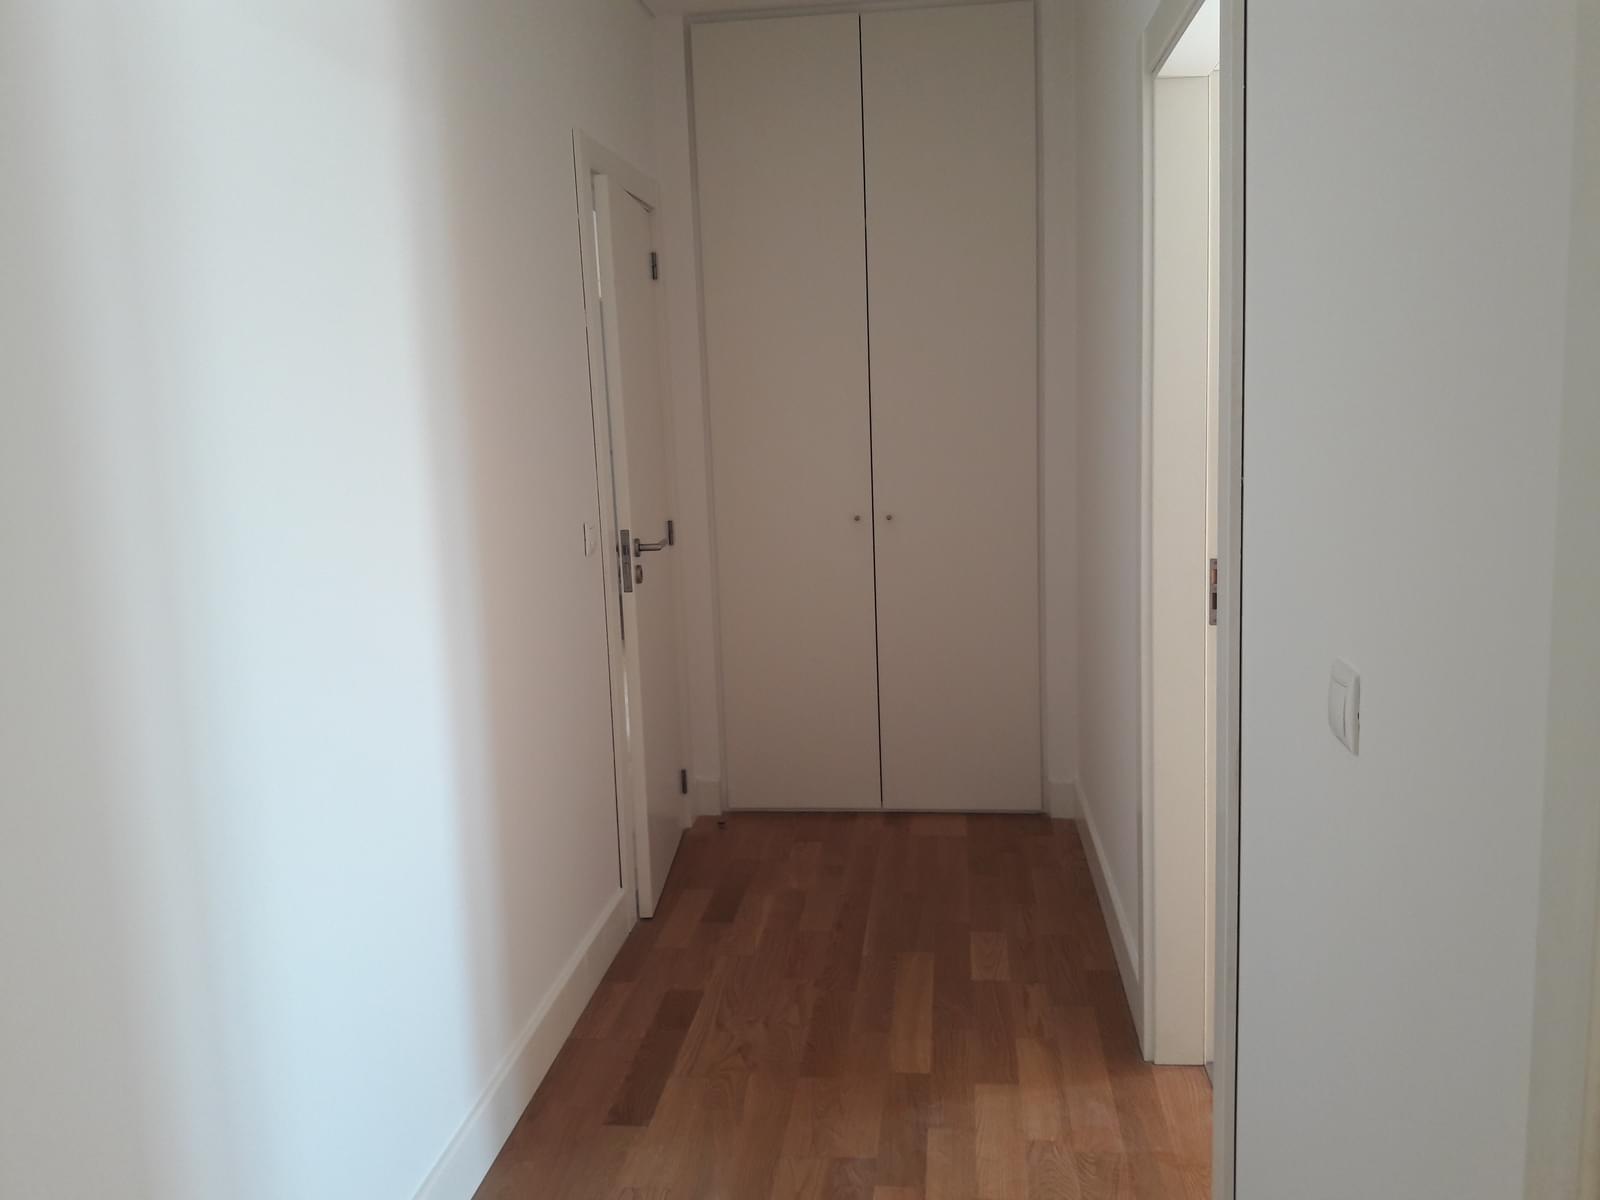 pf18057-apartamento-t3-sintra-c3e90494-be50-4bbd-911c-95a557f42ad5